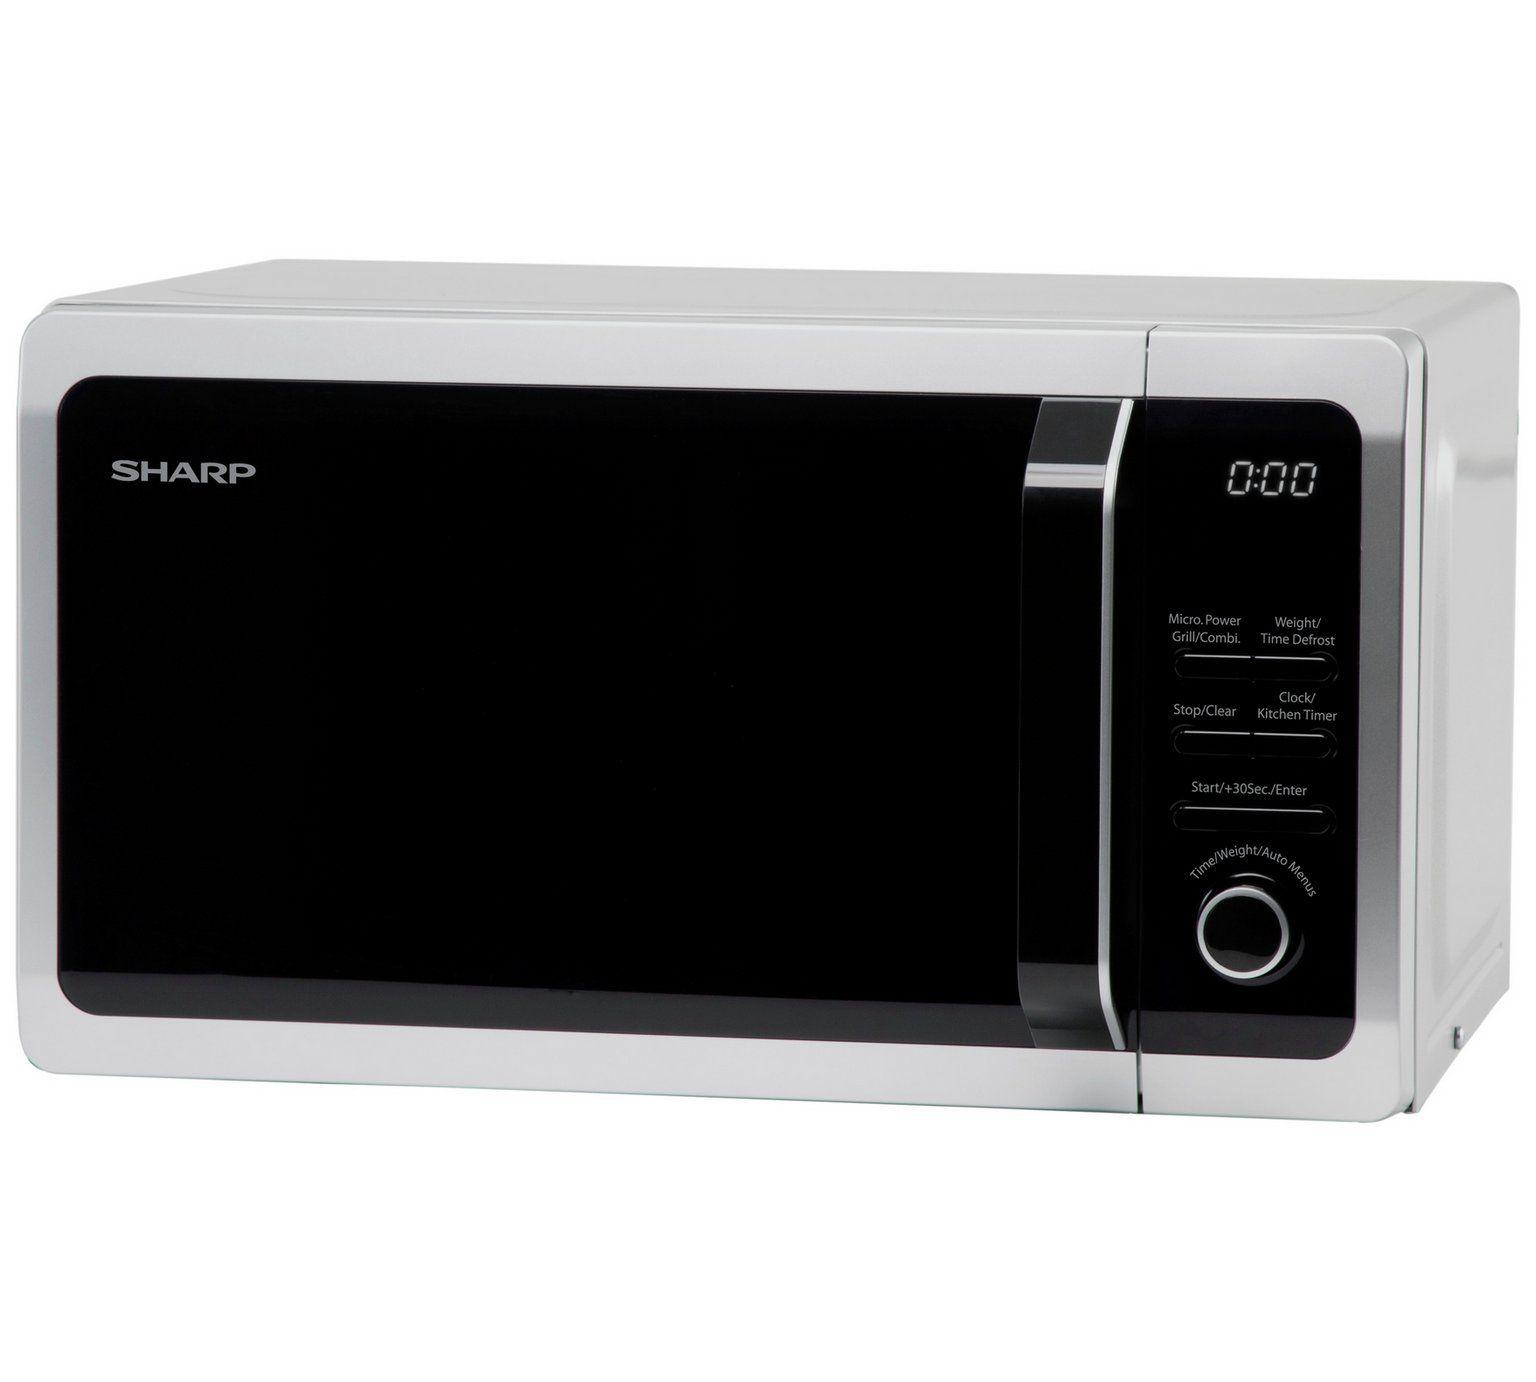 Microwave Oven Argos Co Uk Bestmicrowave